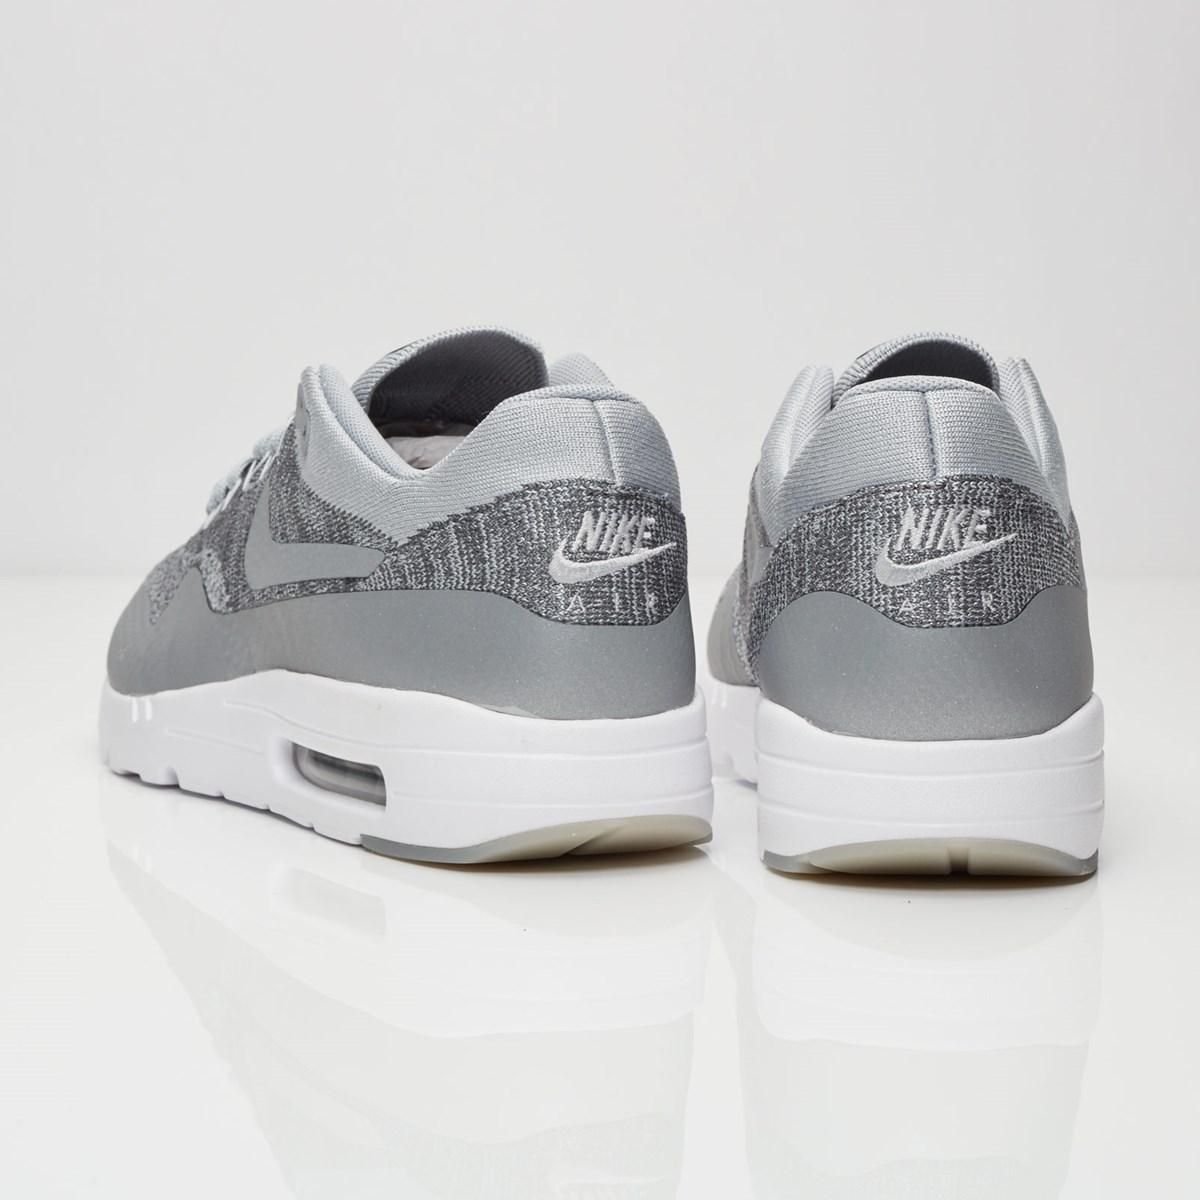 Nike Air Max 1 Ultra Flyknit 843384 001 Sneakersnstuff